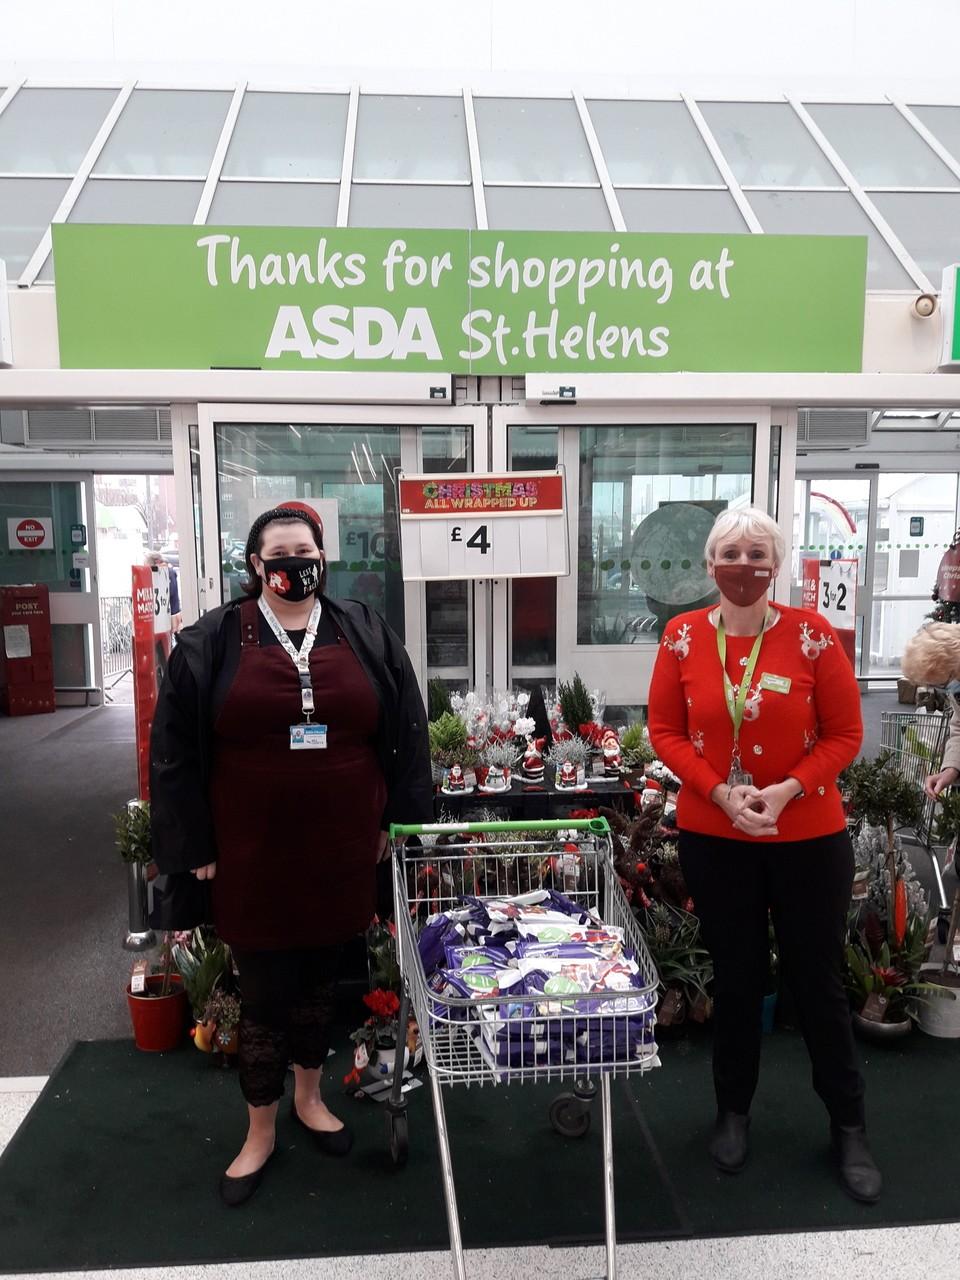 Asda St Helen's bring smiles this Christmas..... | Asda St Helens